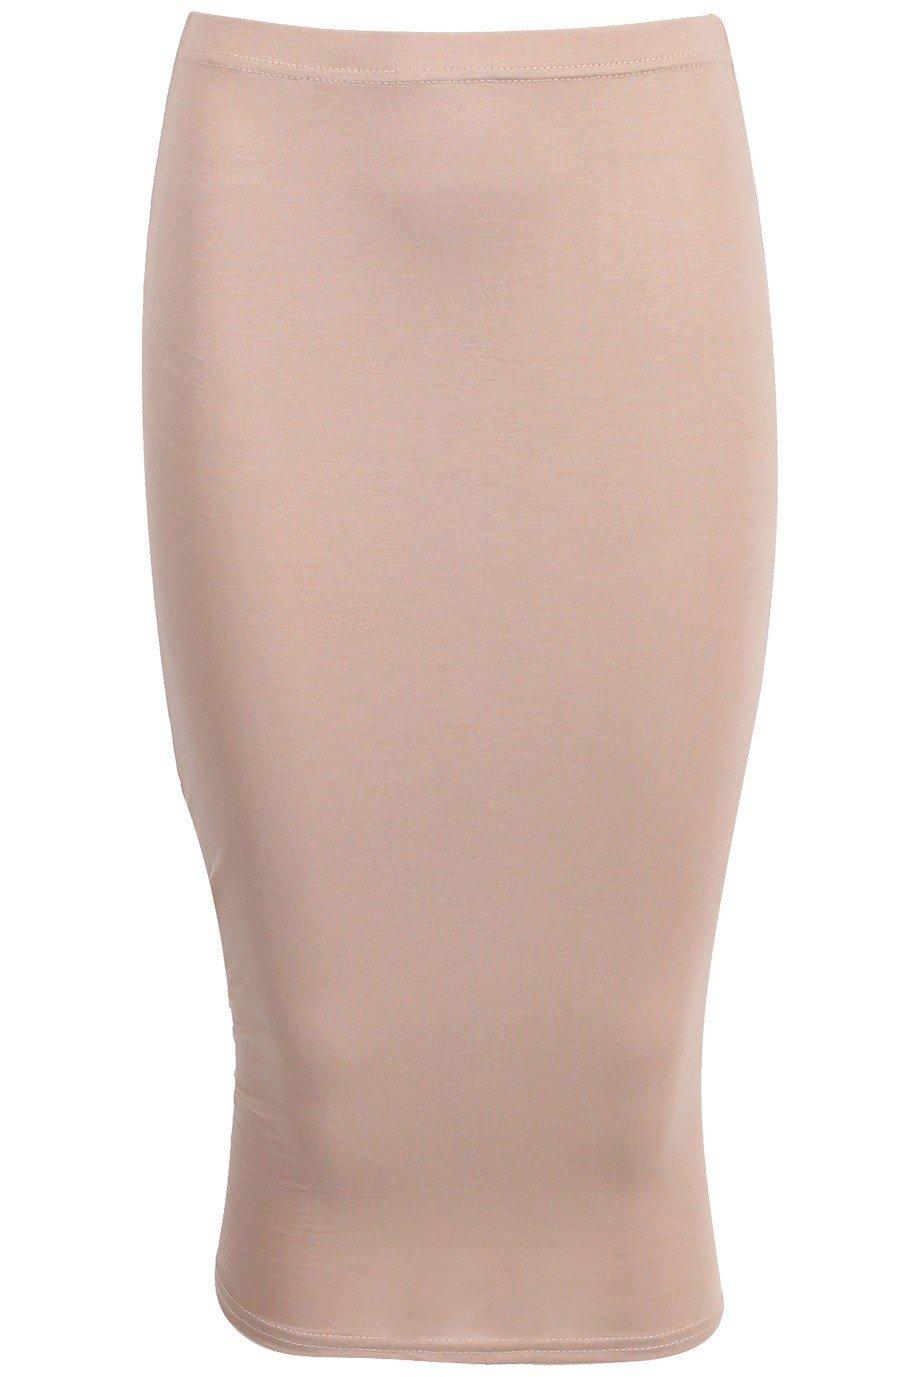 Ladies Girls Jersey Bodycon Pencil Skirt UK Size 8-14: Amazon.co.uk:  Clothing